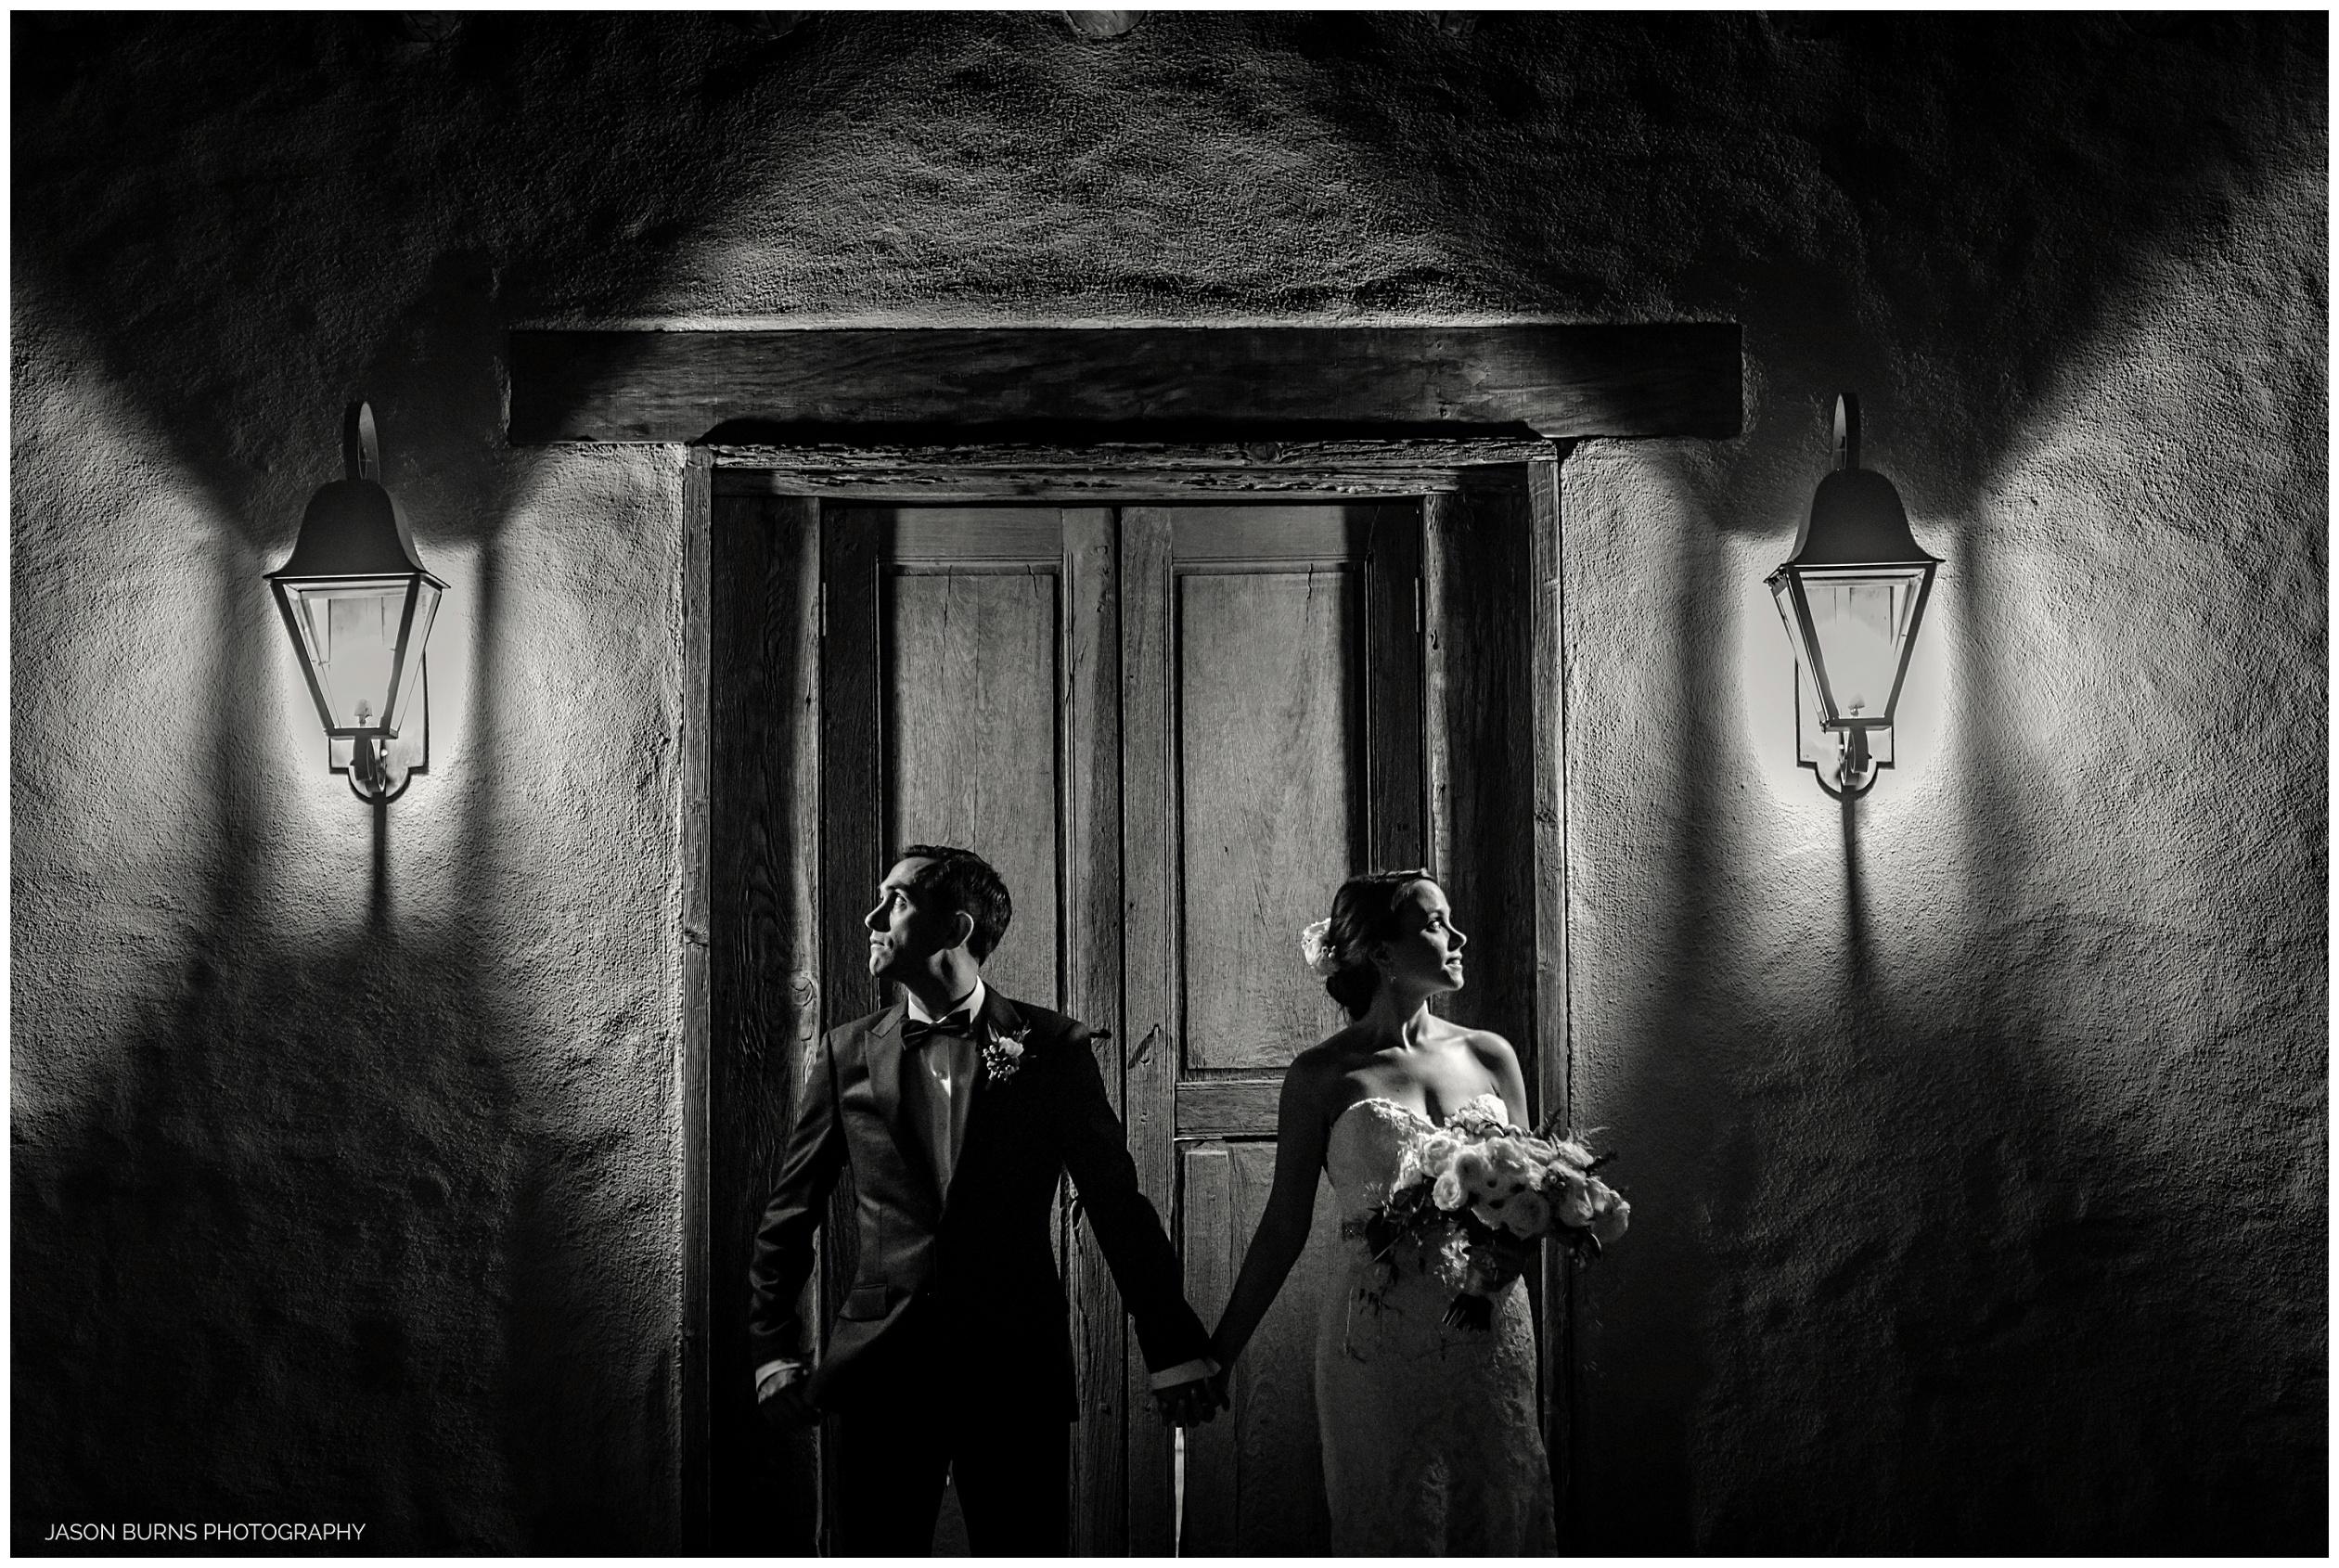 Bride and groom The Hacienda Door